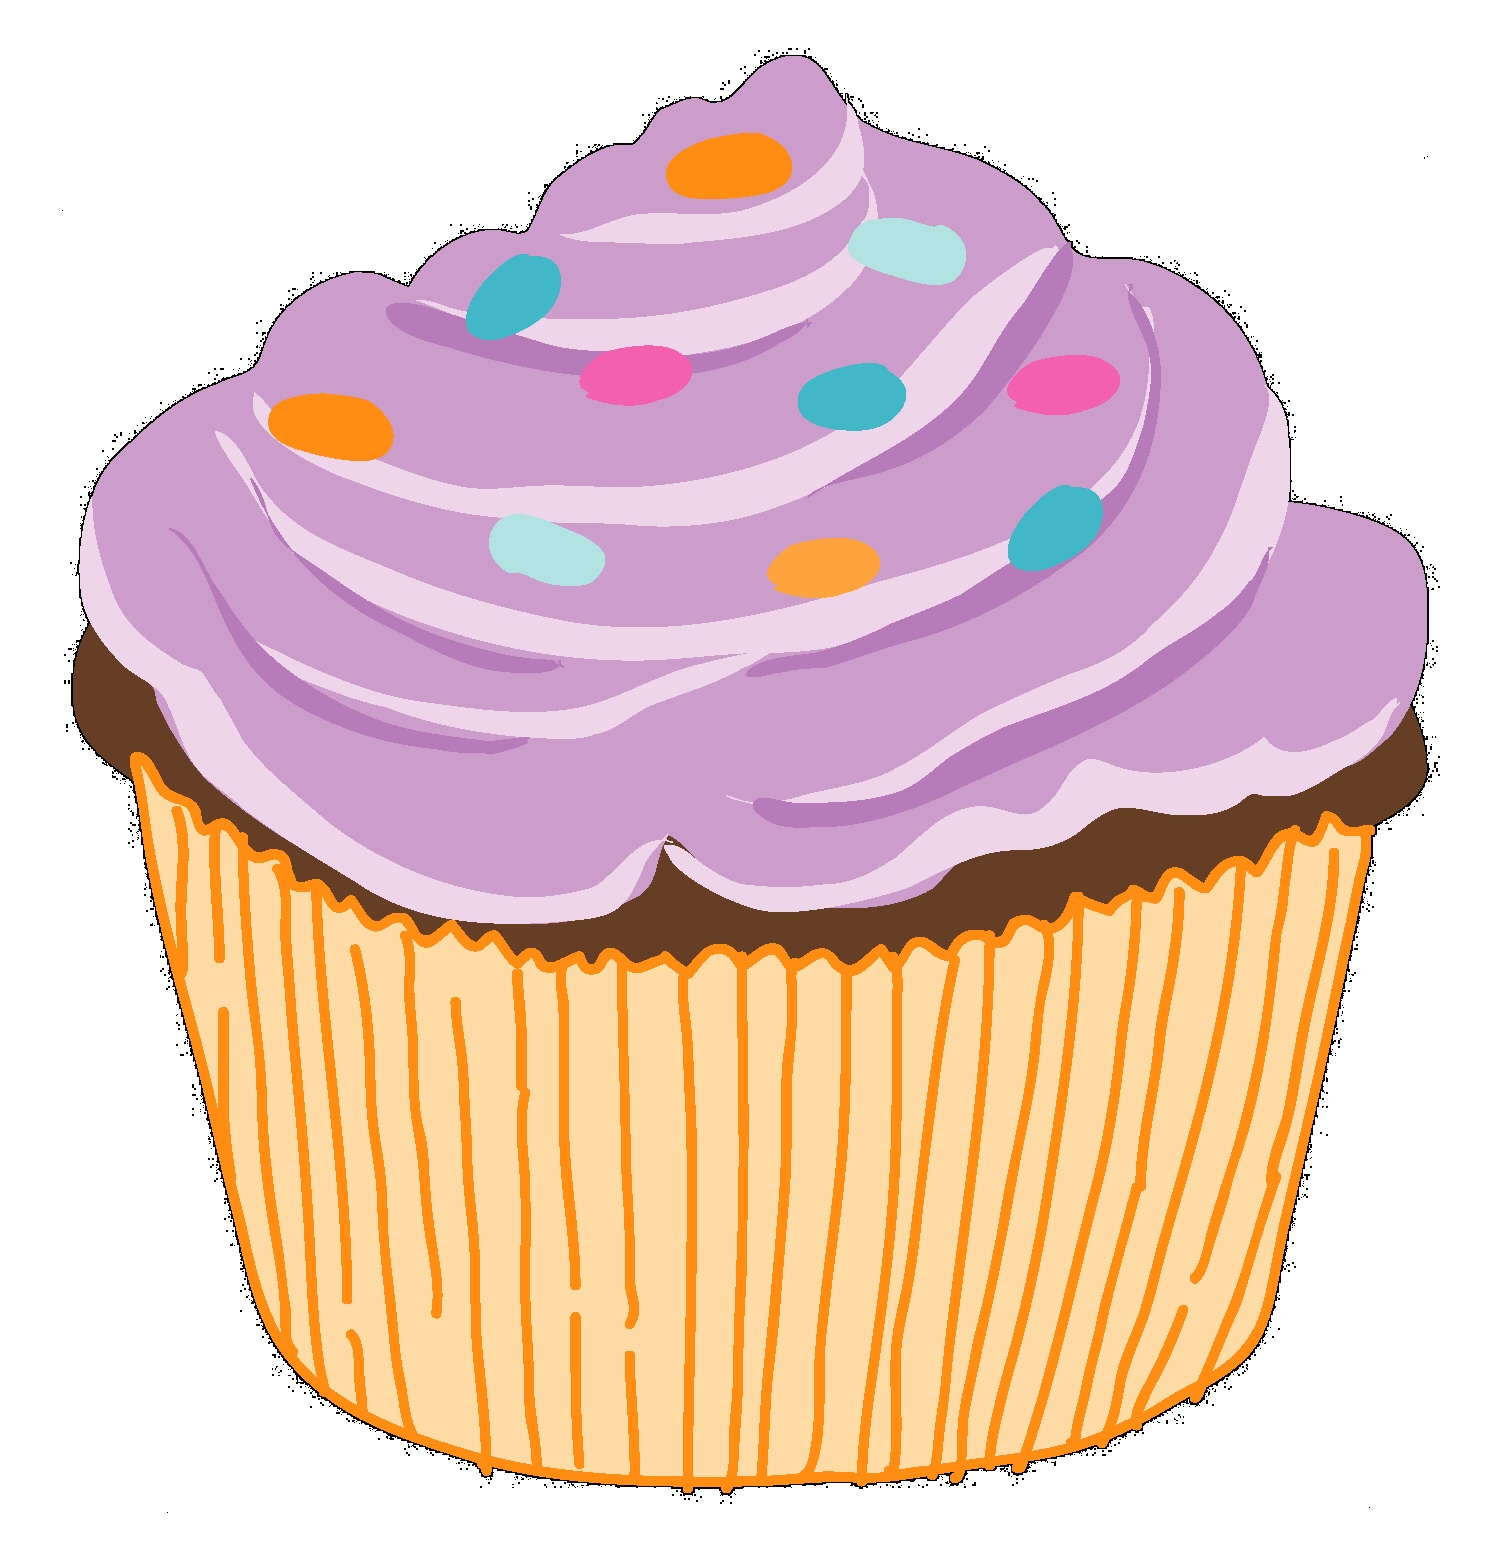 clip art royalty free download Free cupcake cliparts download. Cupcakes clipart